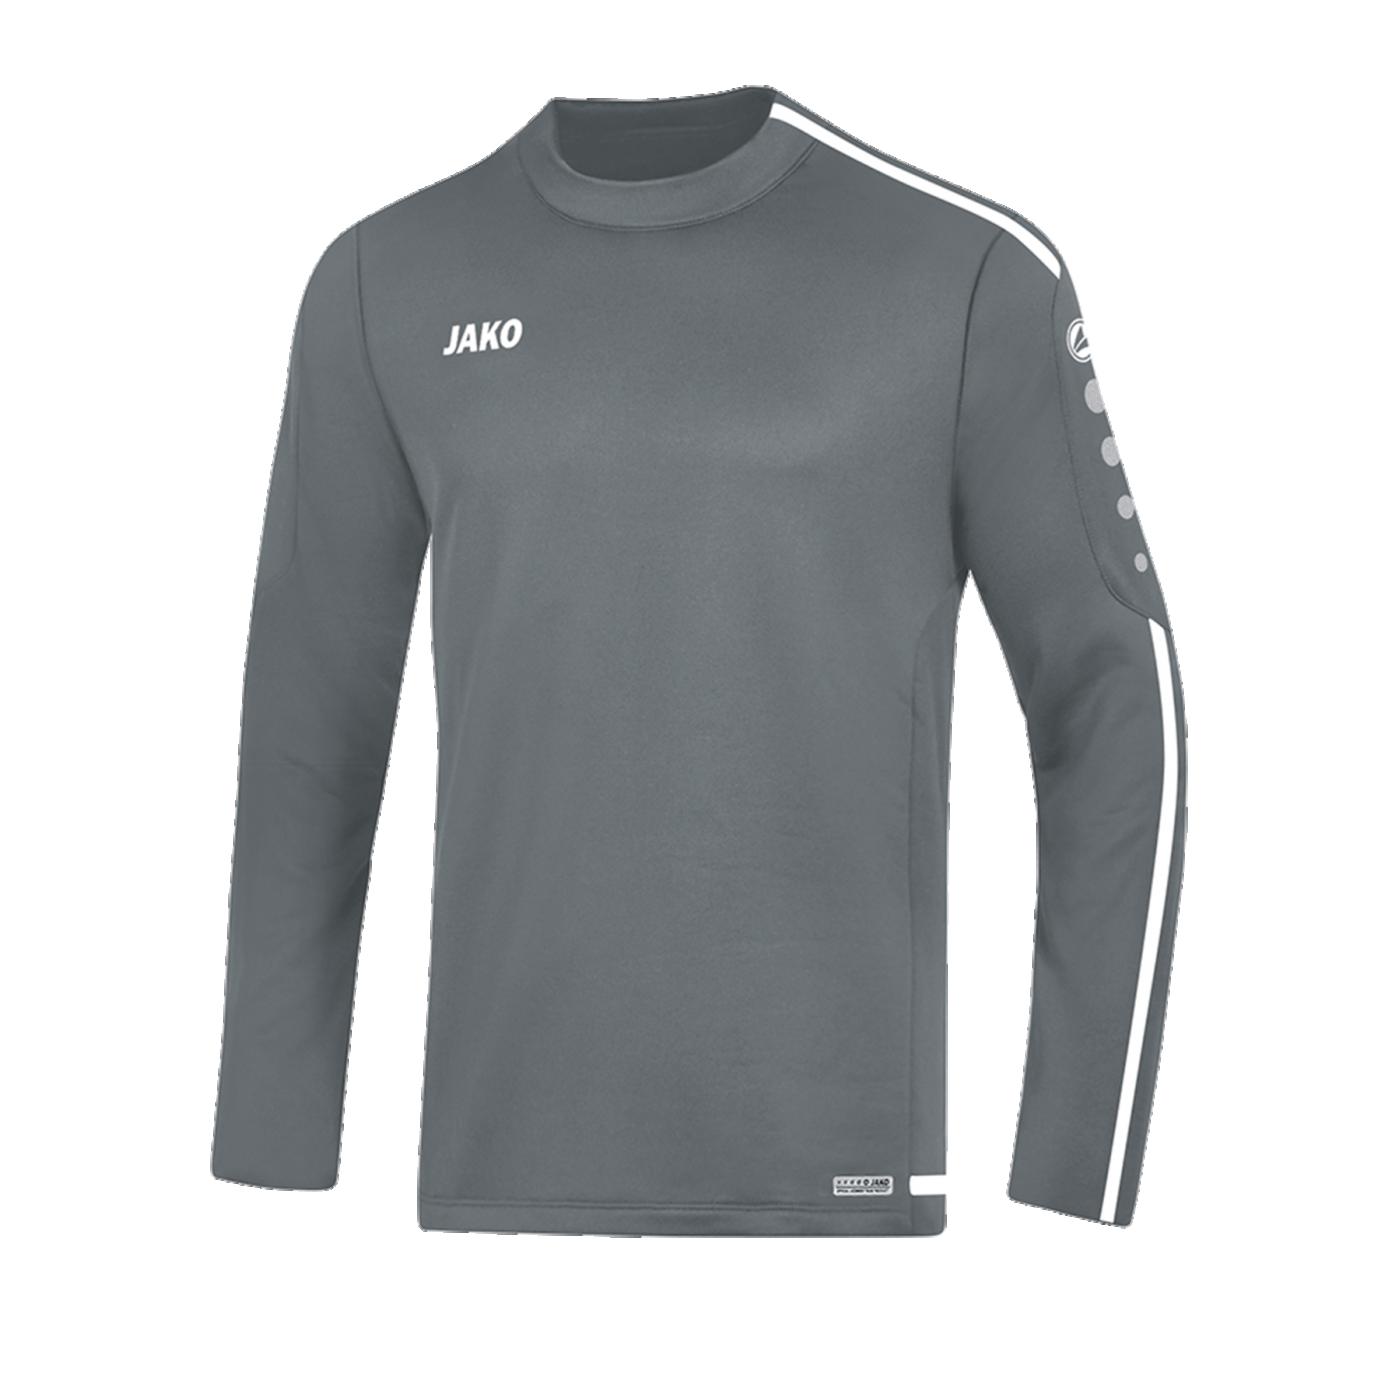 Jako Striker 2.0 Sweatshirt Grau Weiss F40 - Grau